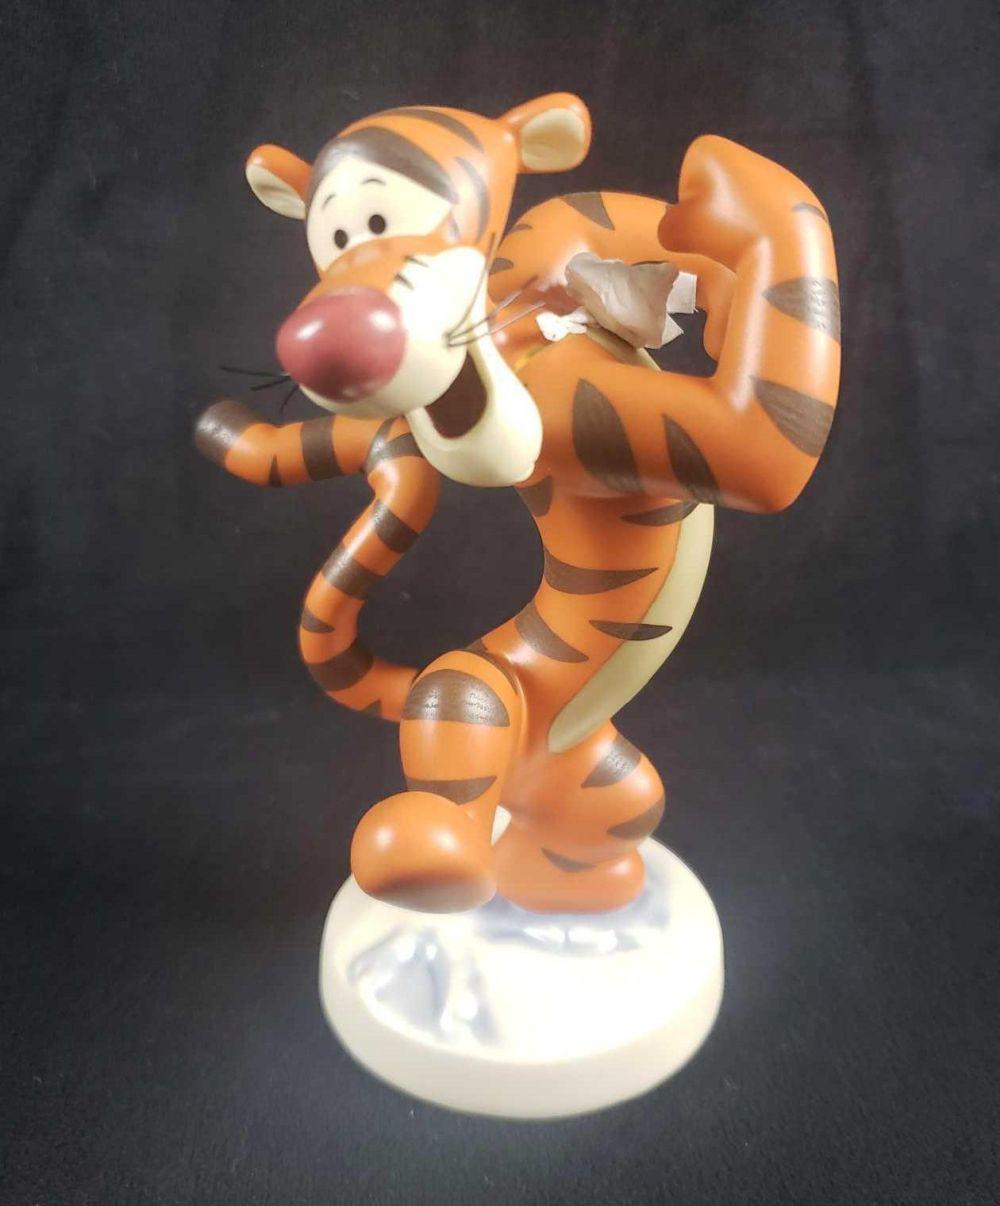 Disney Collectors Society Bounciful Buddy Tigger Figurine